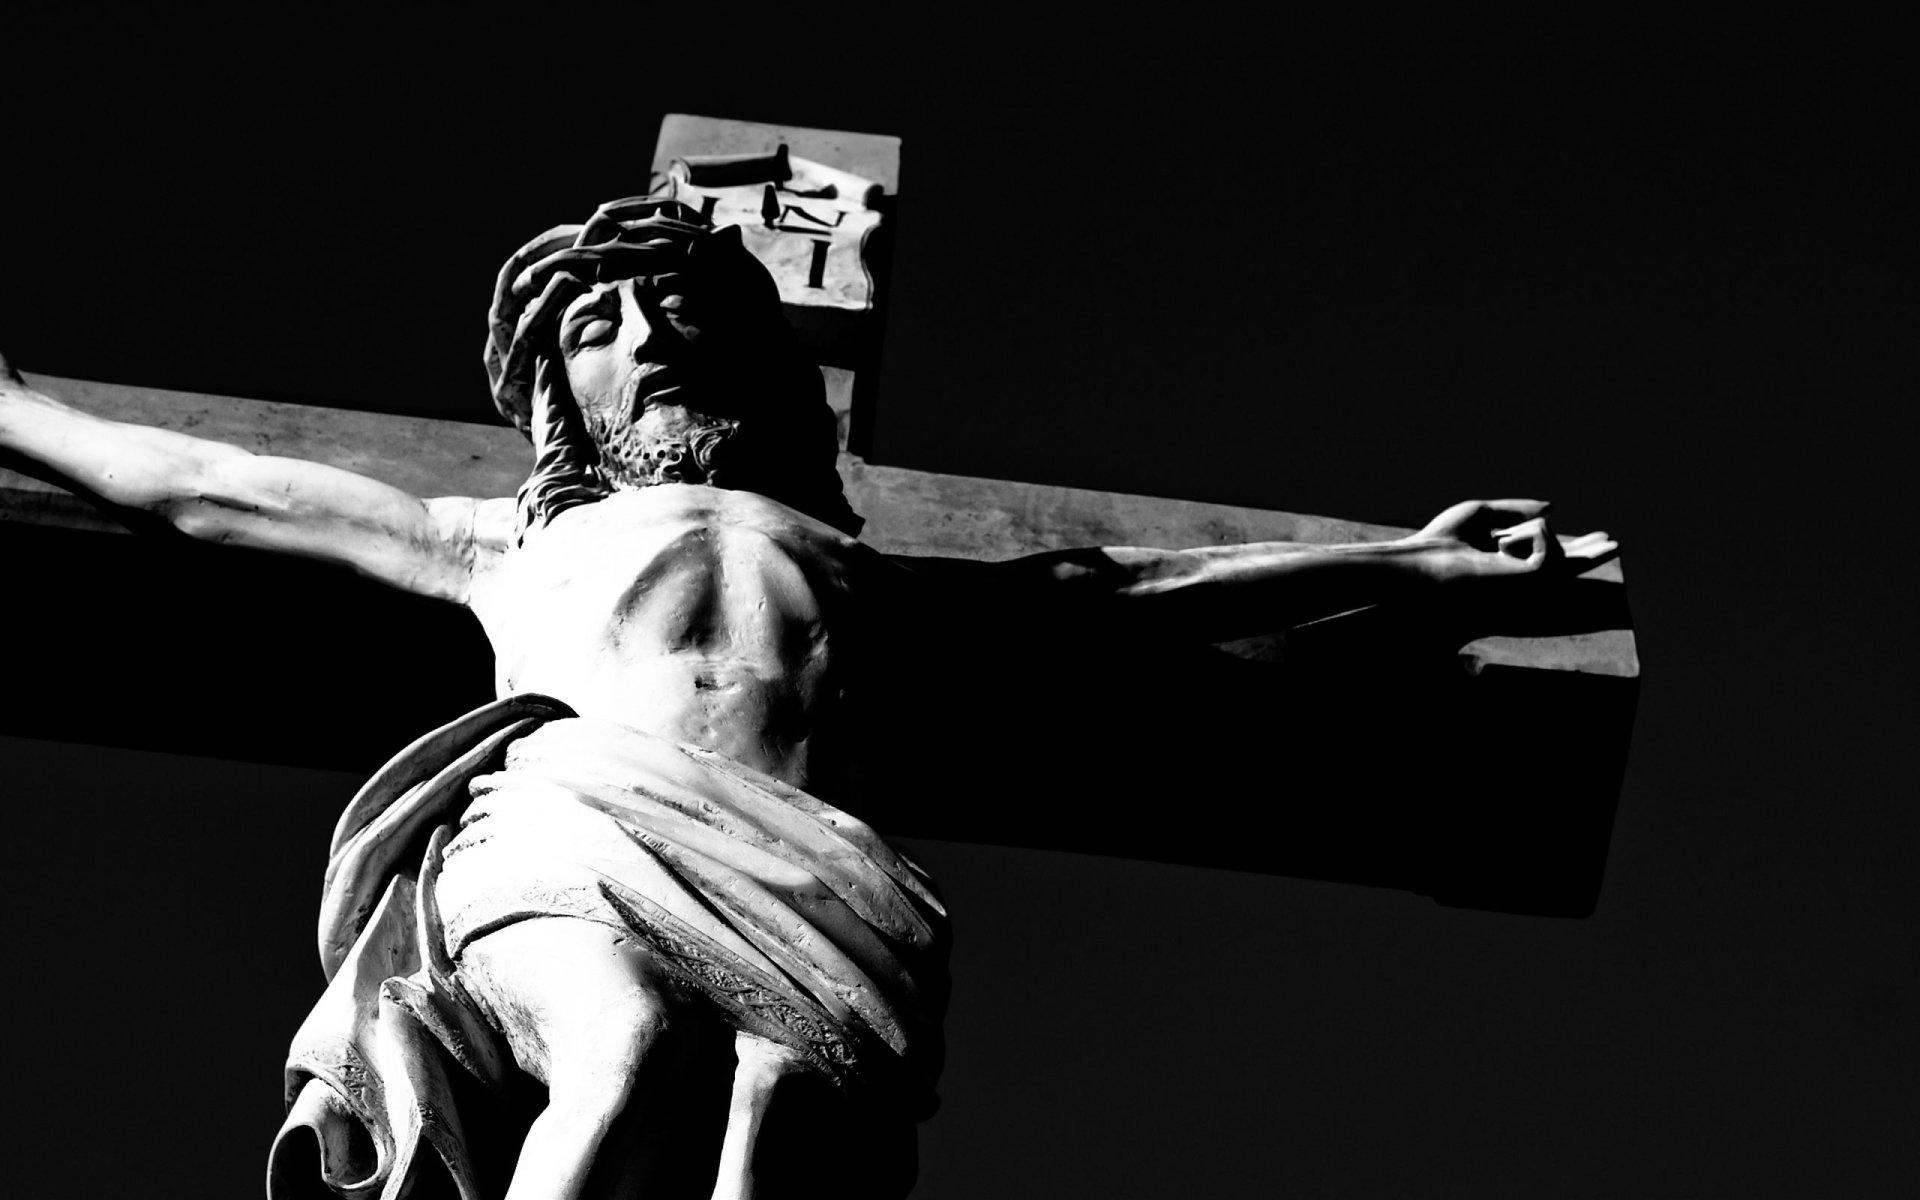 Religioso - Cristiano  Jesus Christ Savior God Fondo de Pantalla